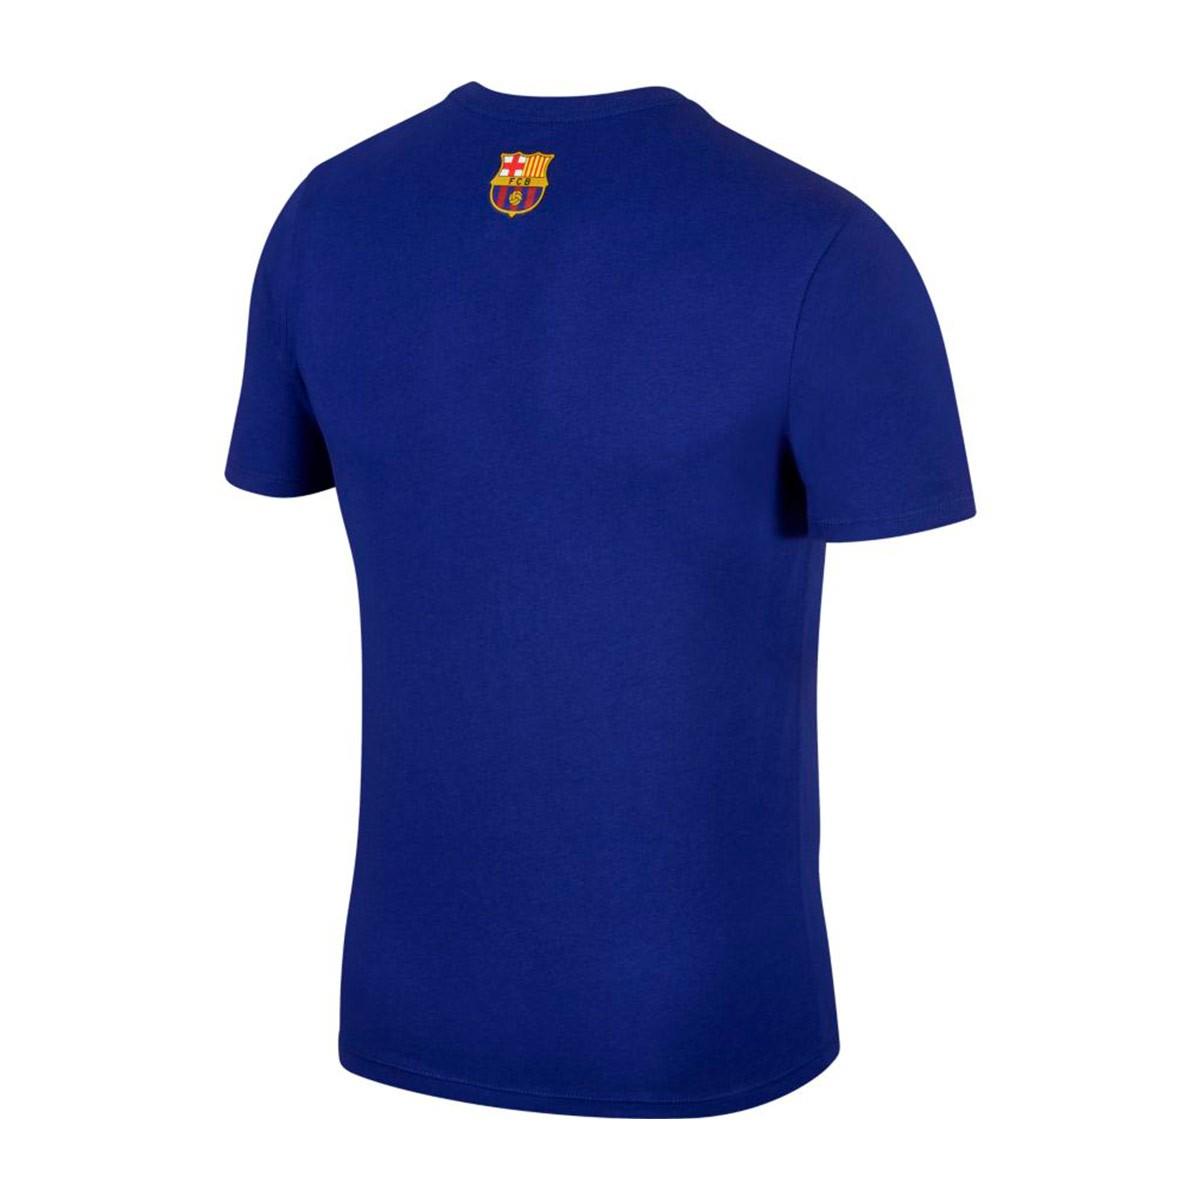 promo code 944e5 8399d Camiseta FC Barcelona 20 years Deep royal blue